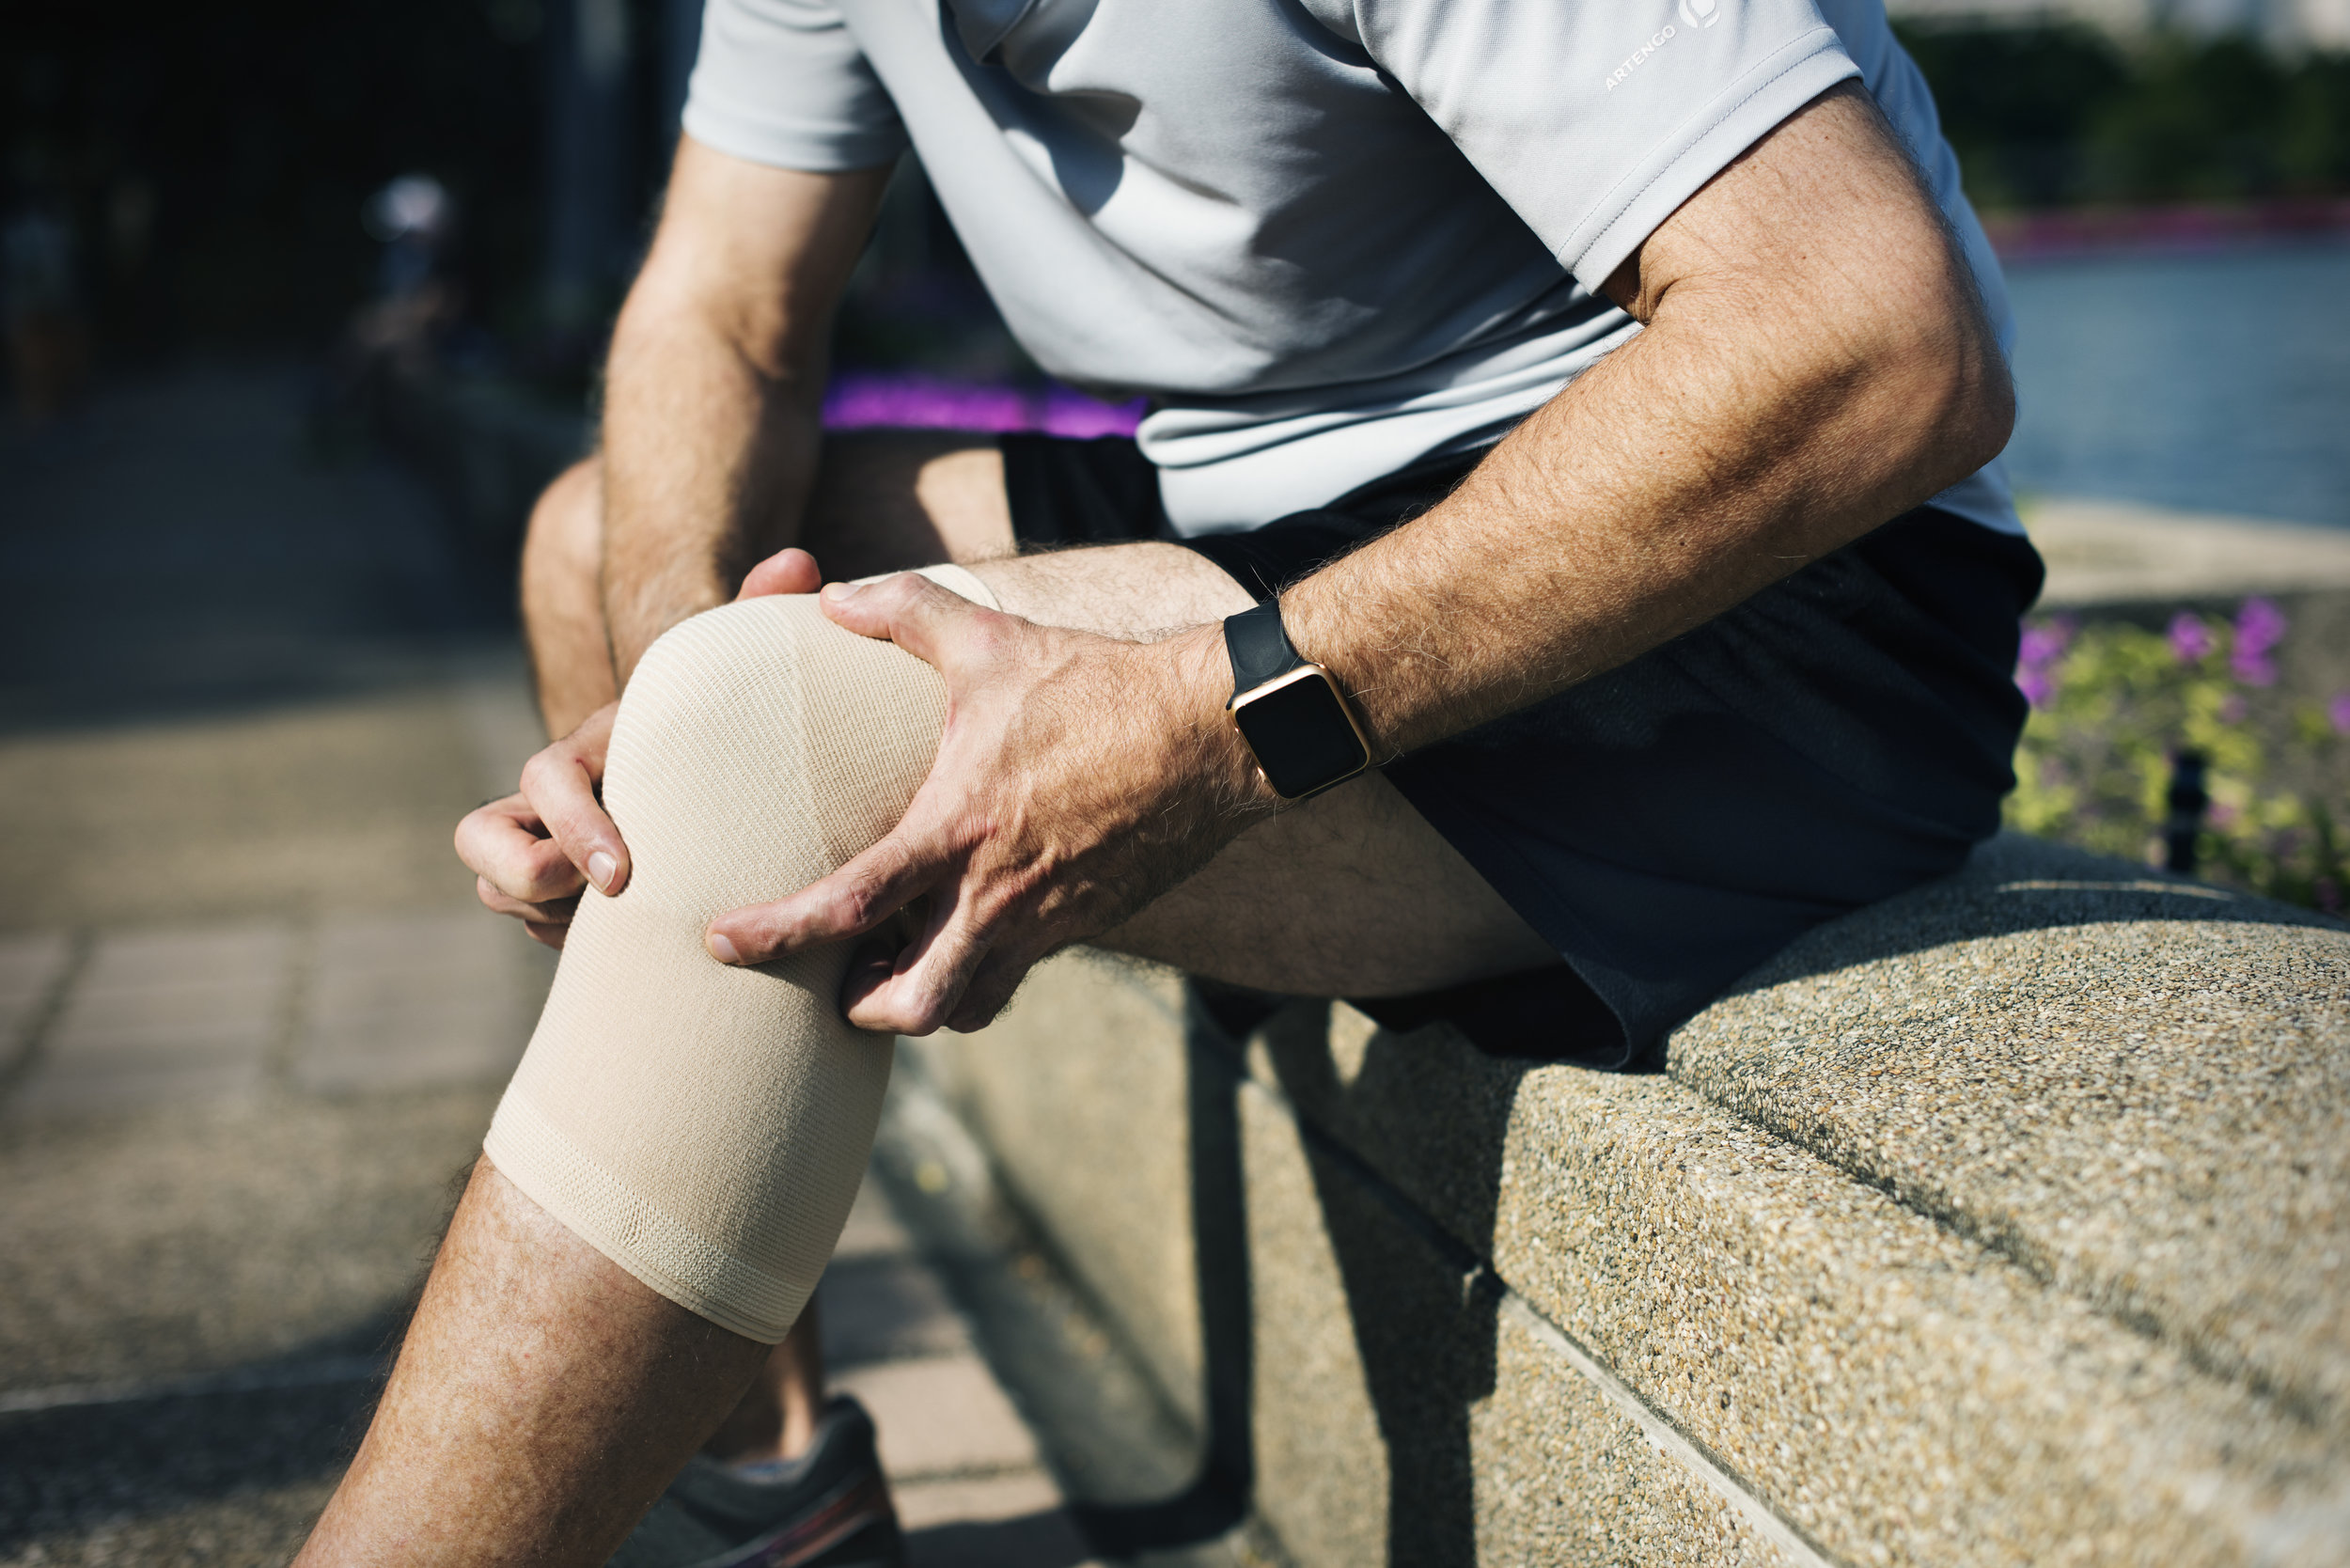 Copy of Elderly man having a knee injury